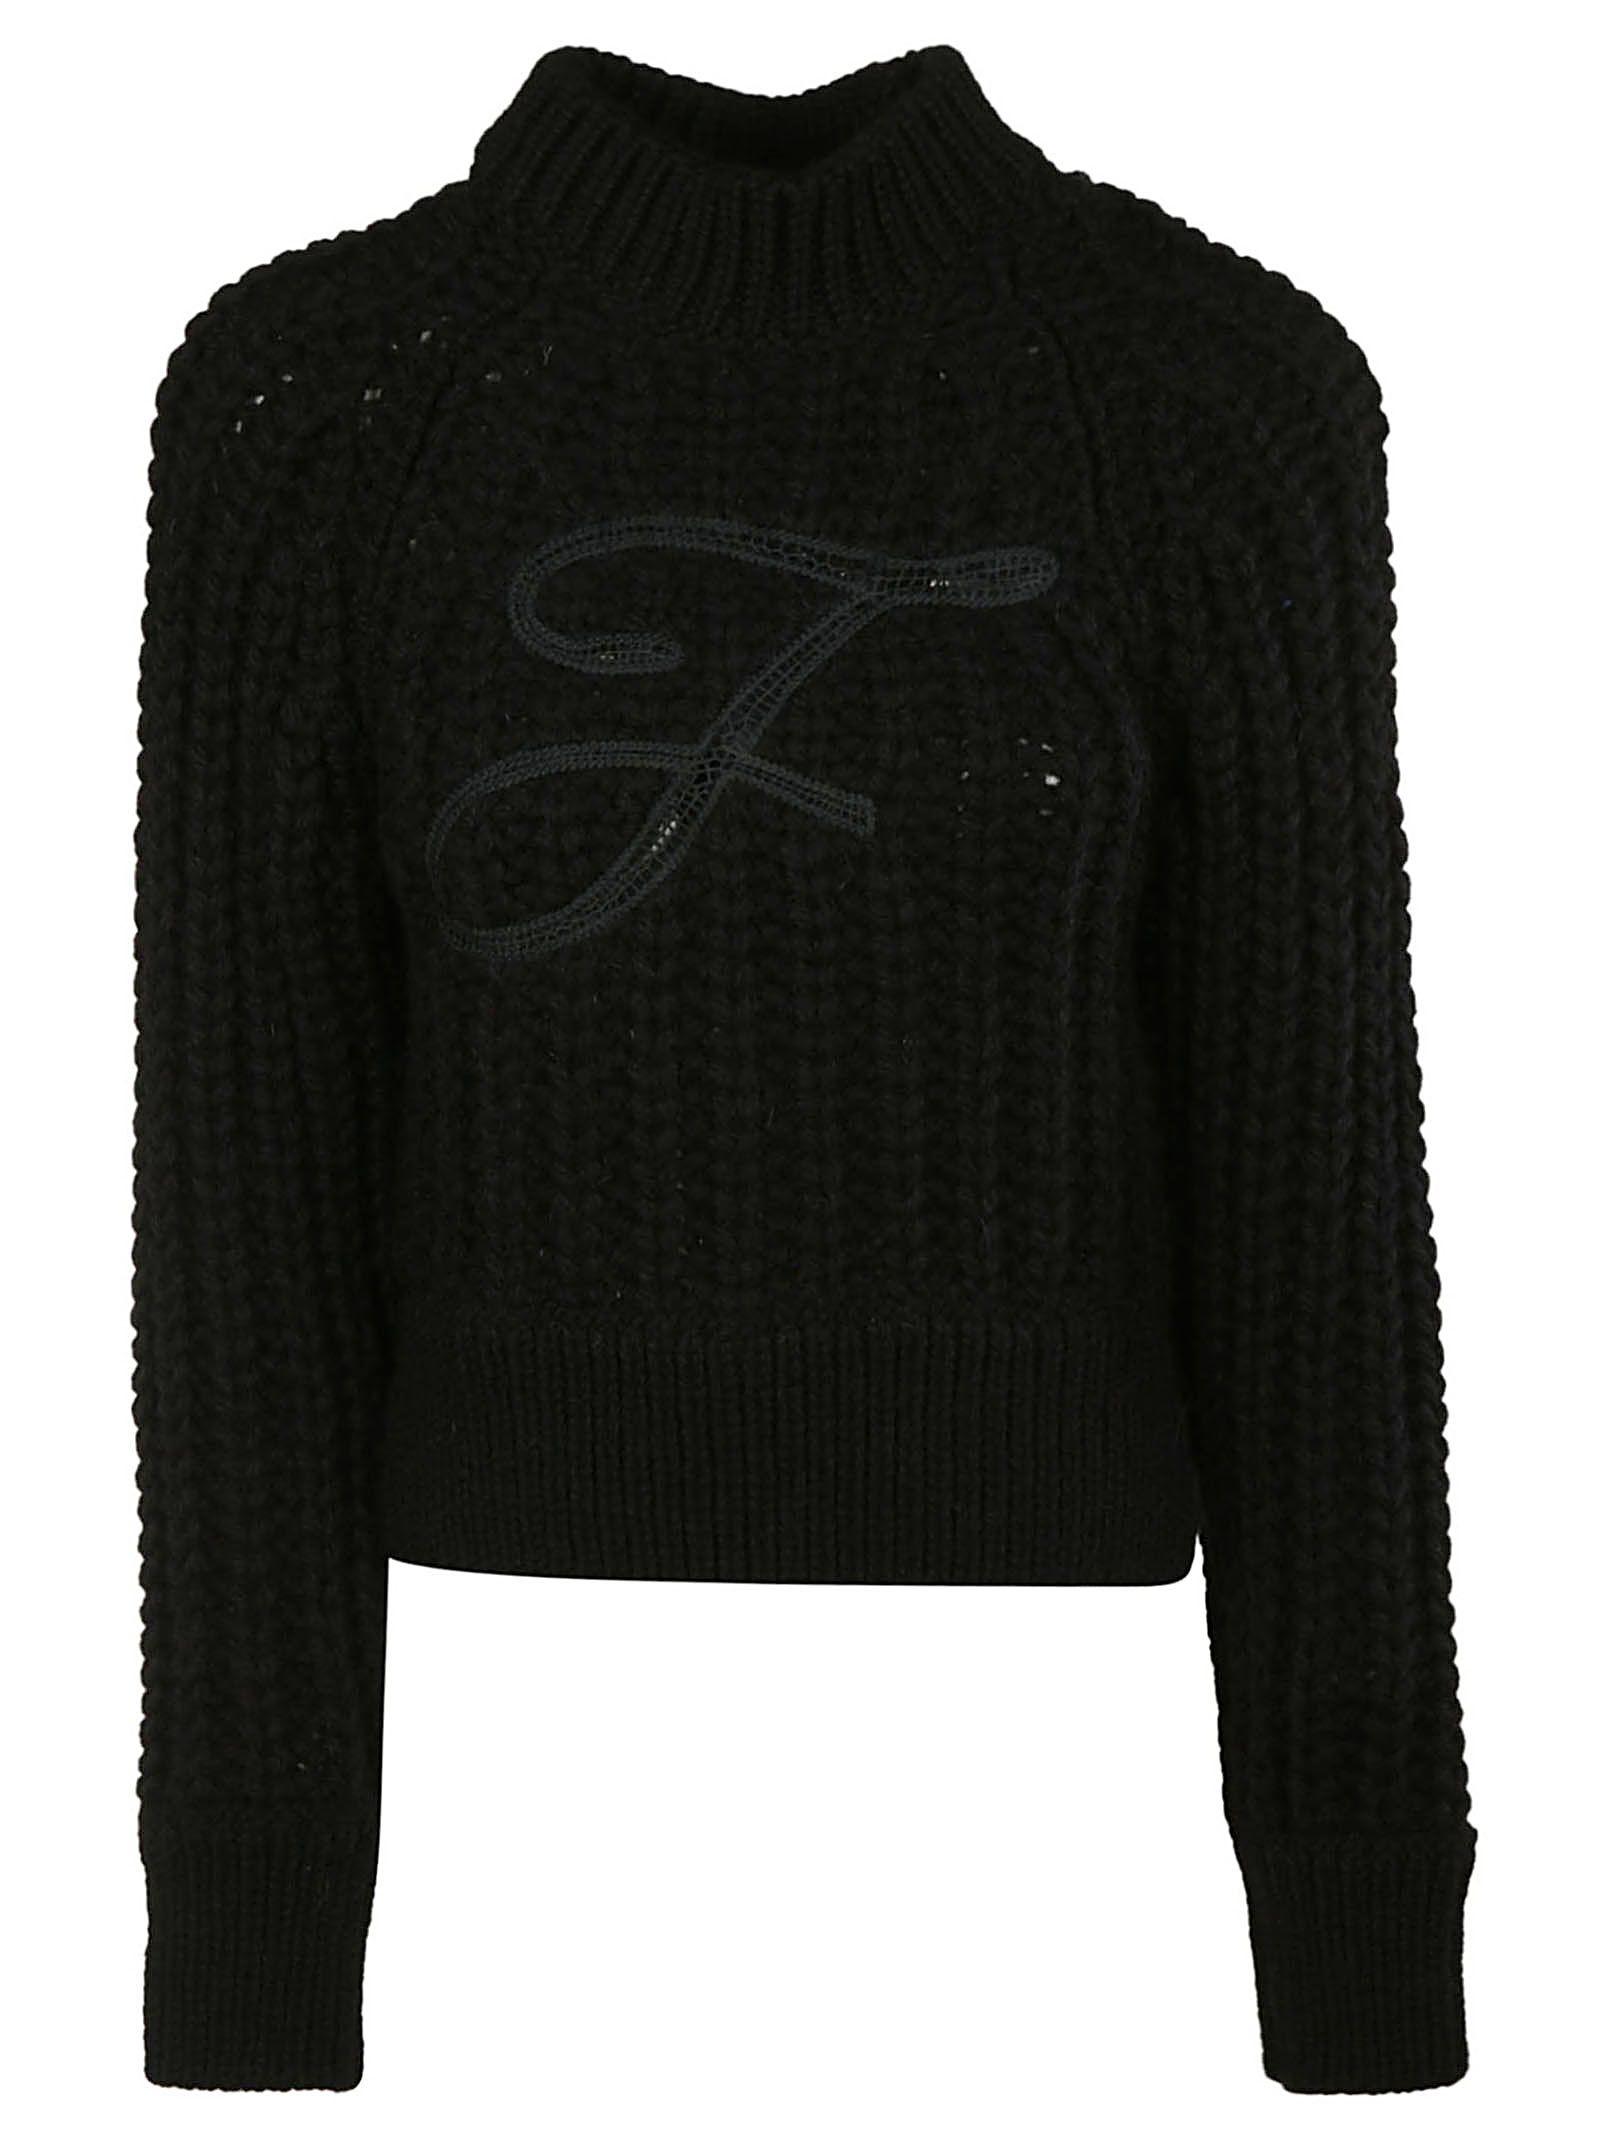 Fendi Knitted Jumper